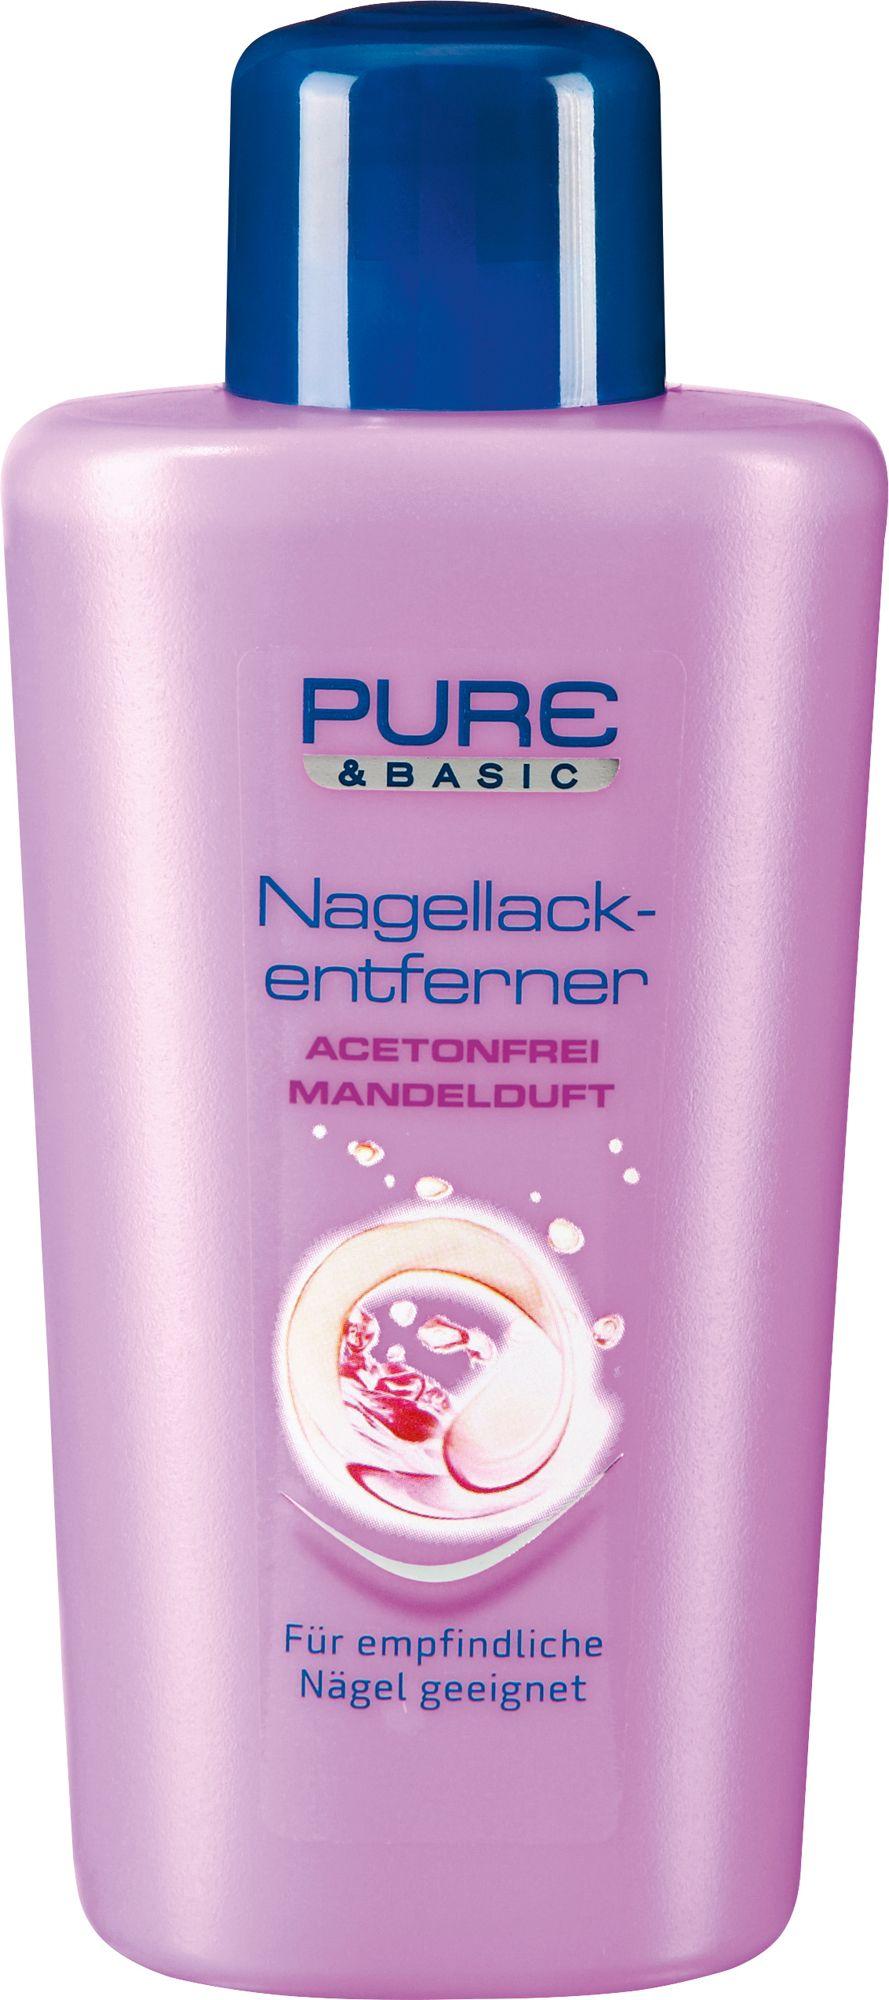 P & B Nagellackentferner Acetonfrei 200 ml | Lebensmittel ...